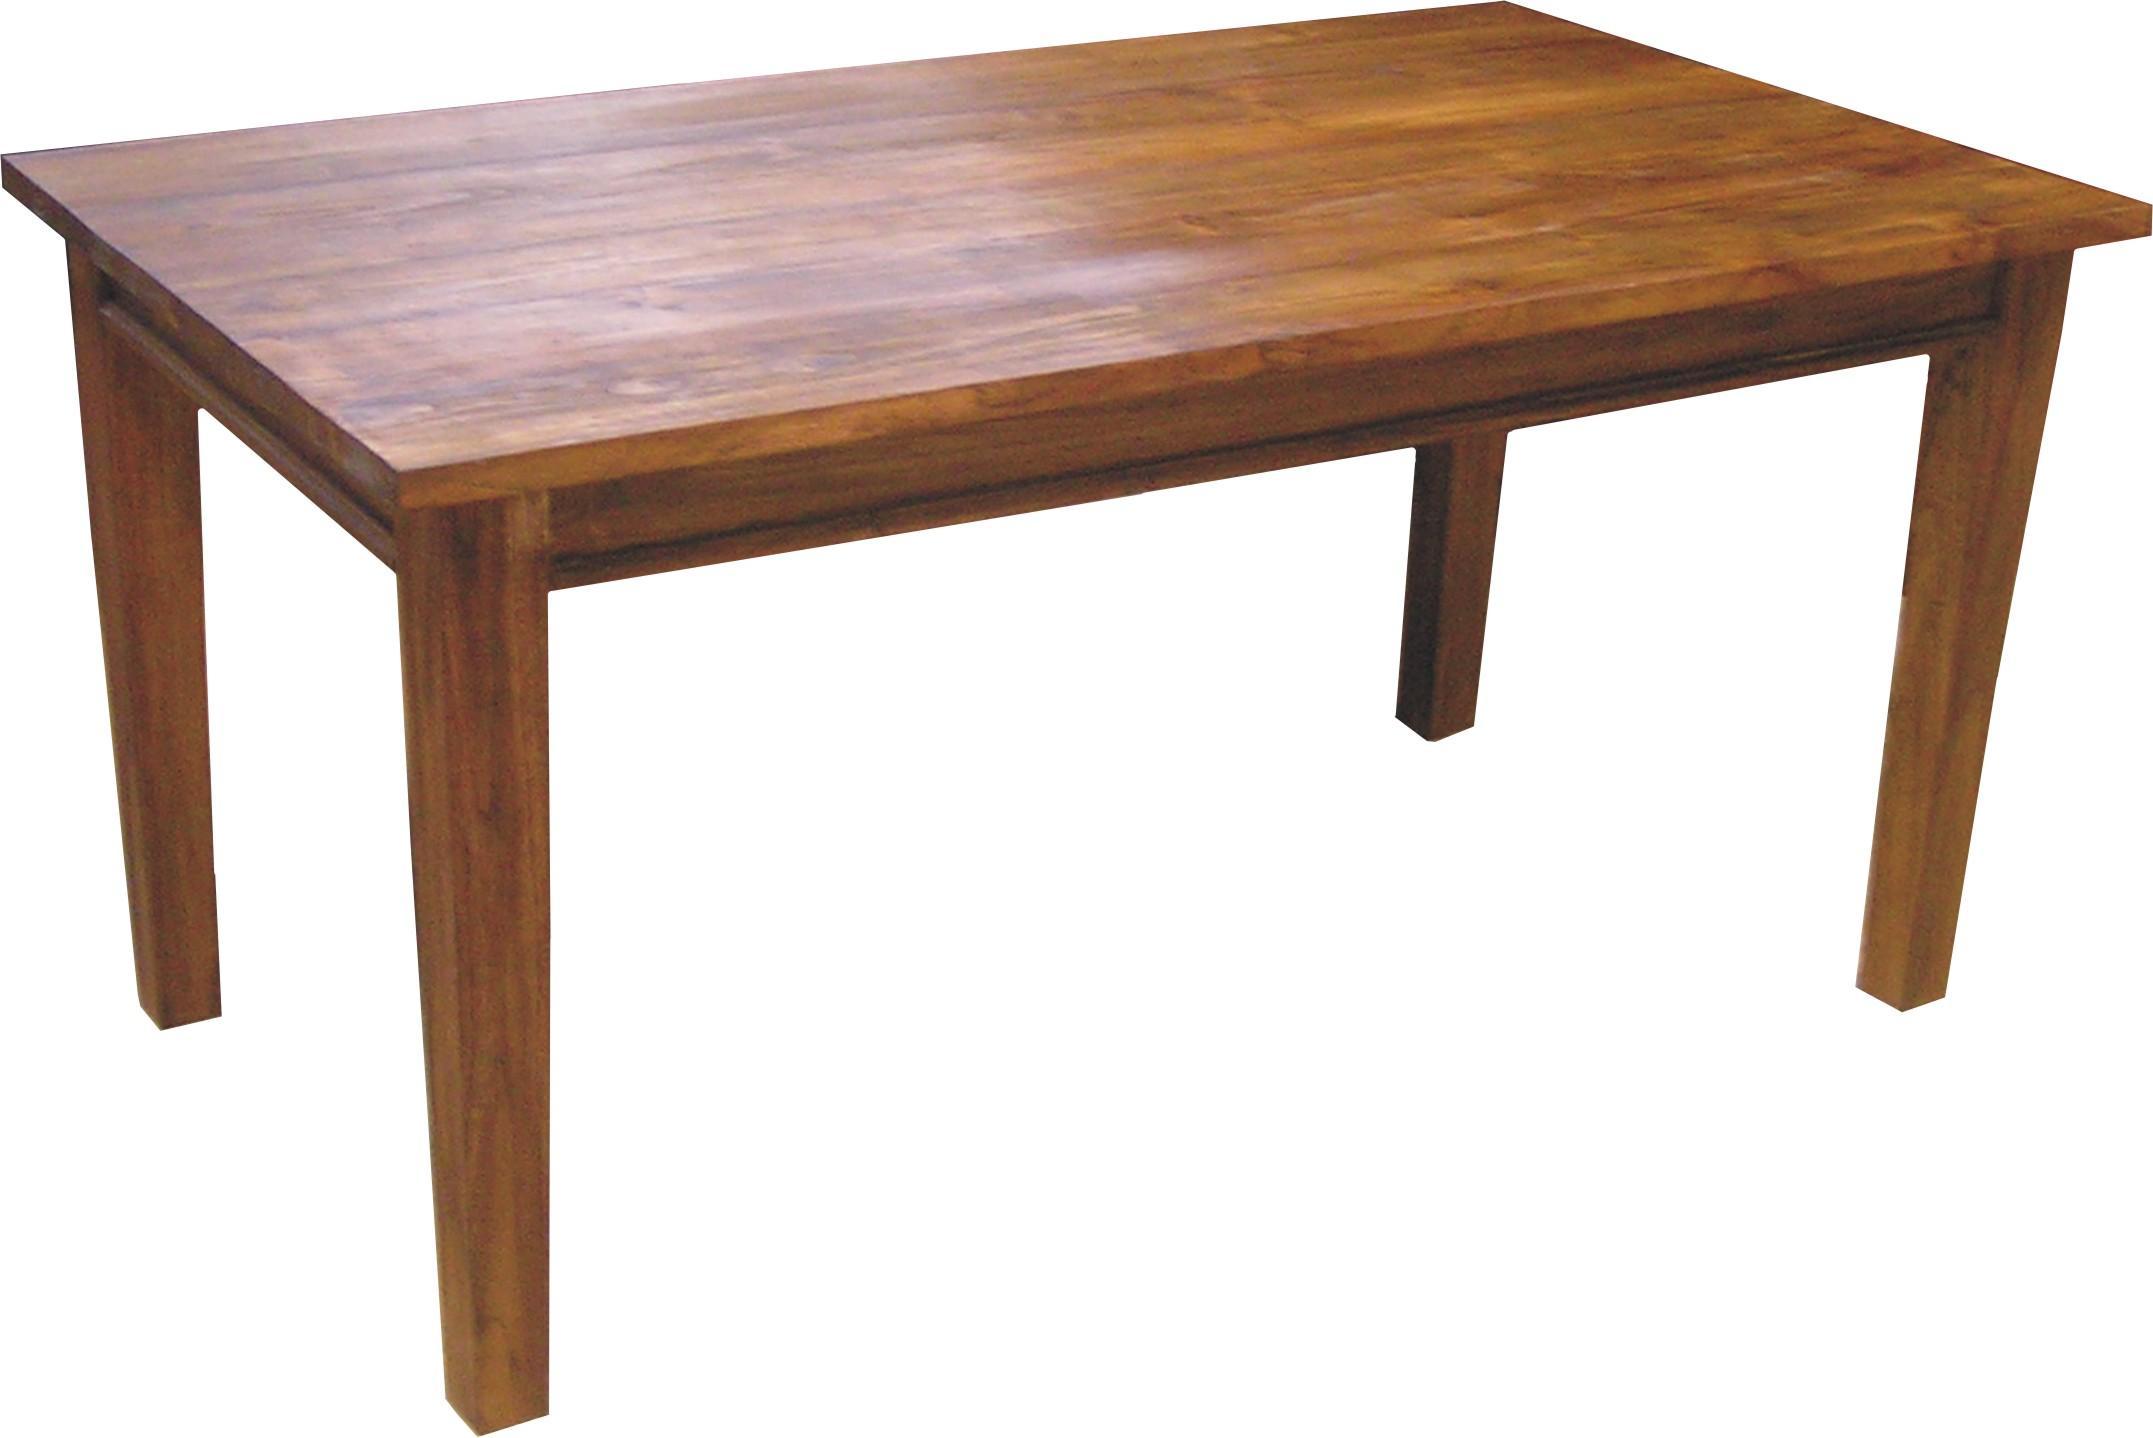 Tavoli da ristoranti design 100 0 1000 0 pezzi for Tavoli da design